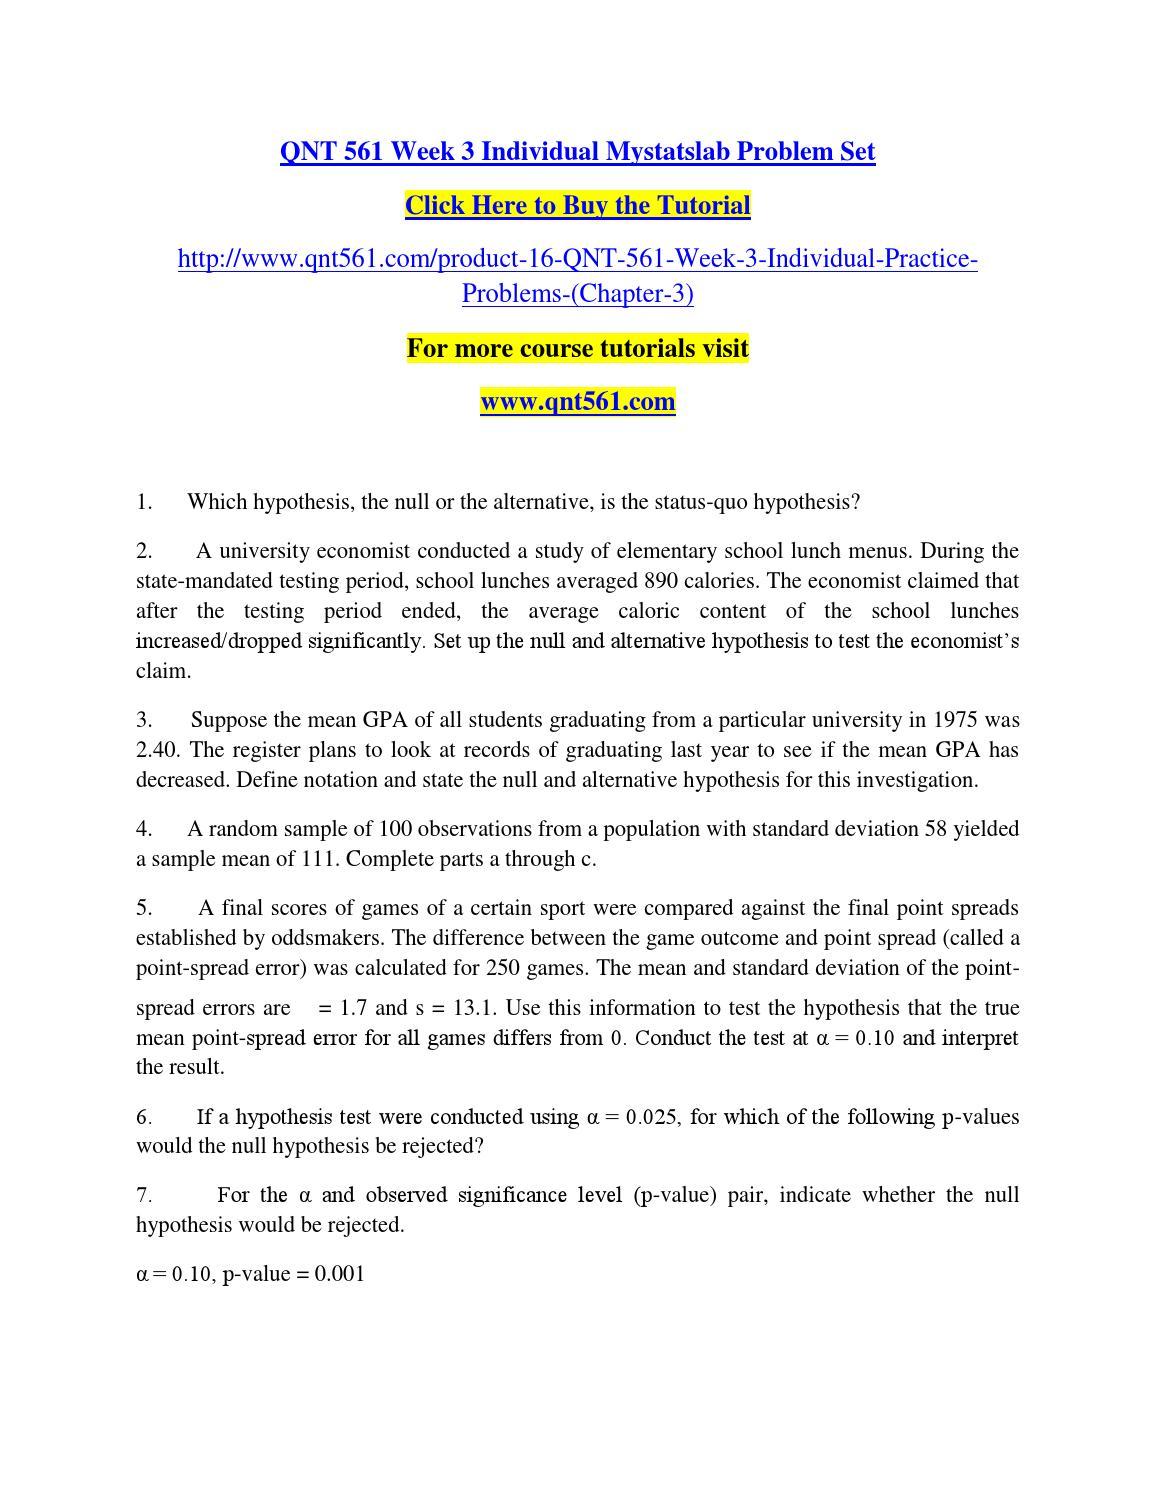 Qnt 561 Week 3 Individual Mystatslab Problem Set By Vbhngfgvfds Issuu Qnt  561 Week 3 Individual